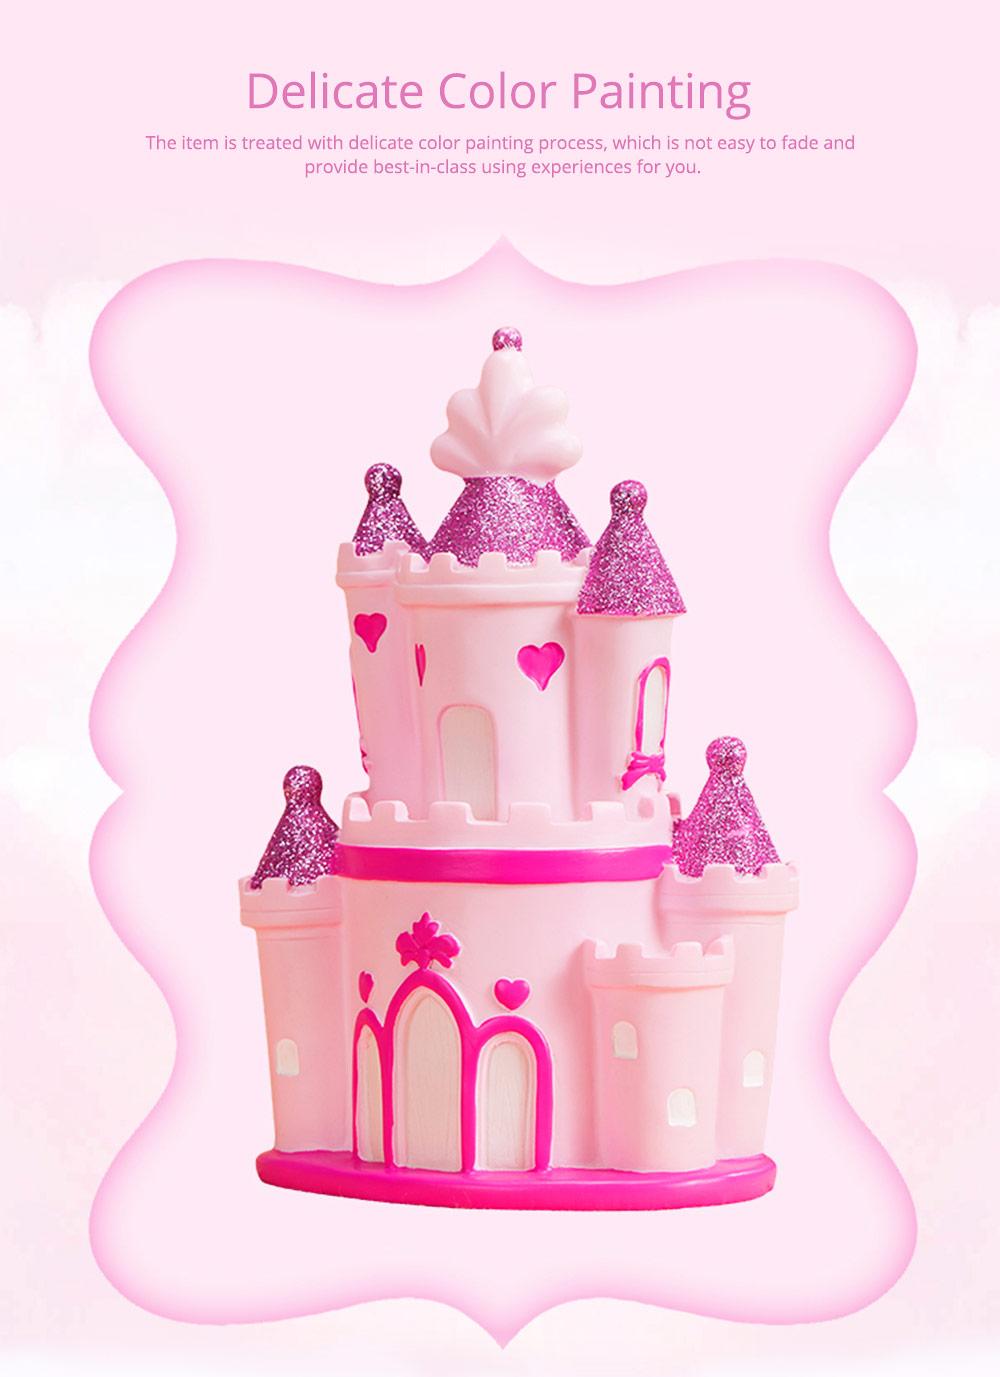 Creative Princess Castle Money Box for Girls, Delicate Elegant Pink Fairytale Castle Birthday Present Piggy Bank 0